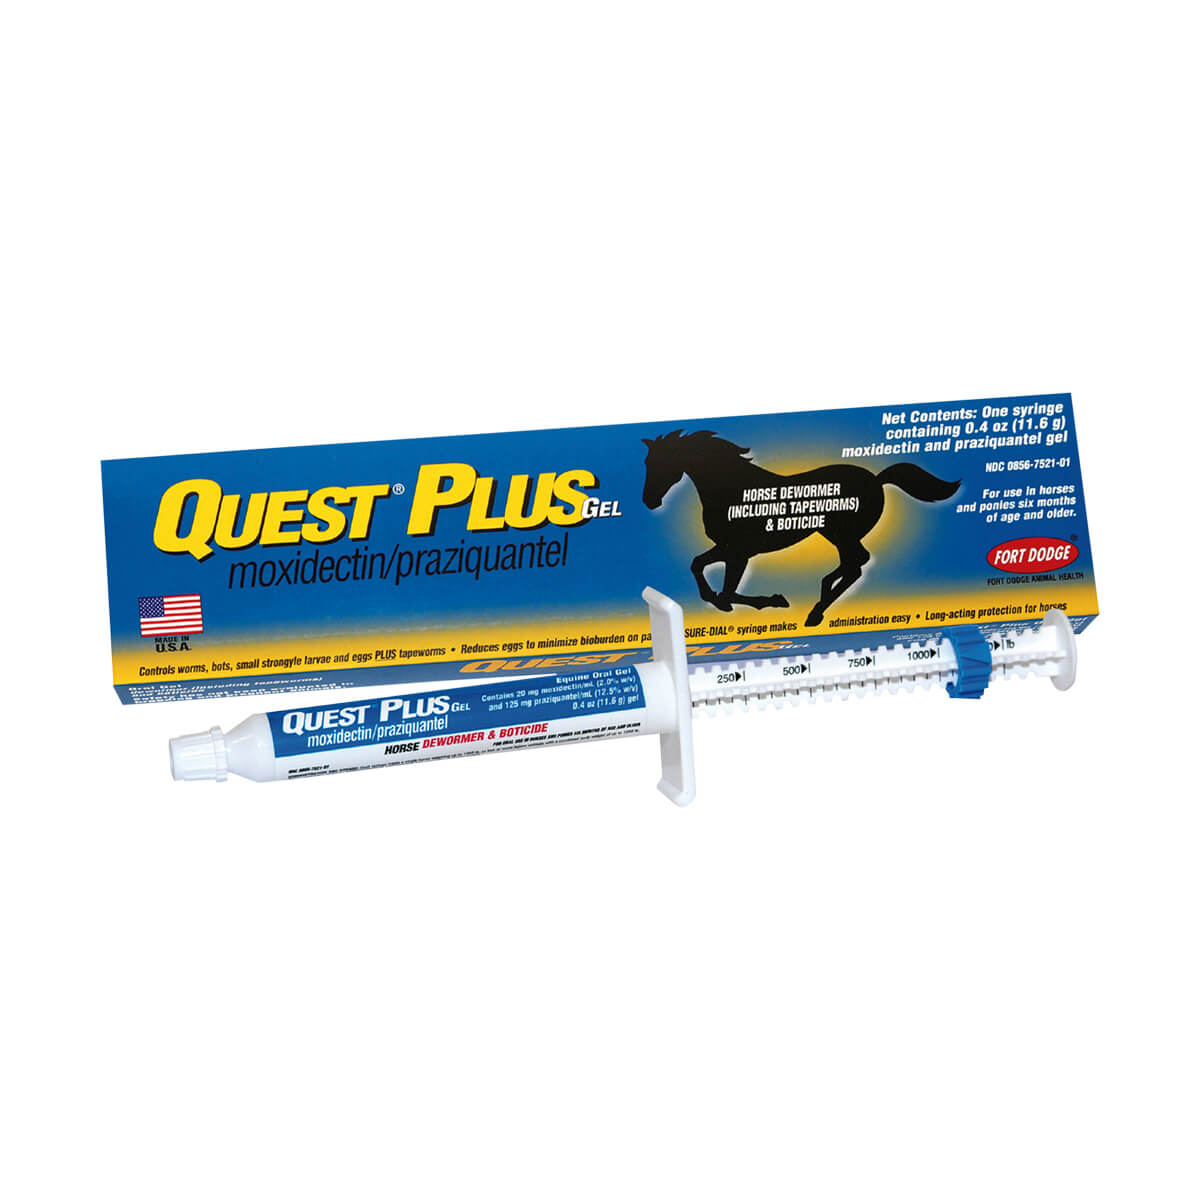 Quest Plus Gel